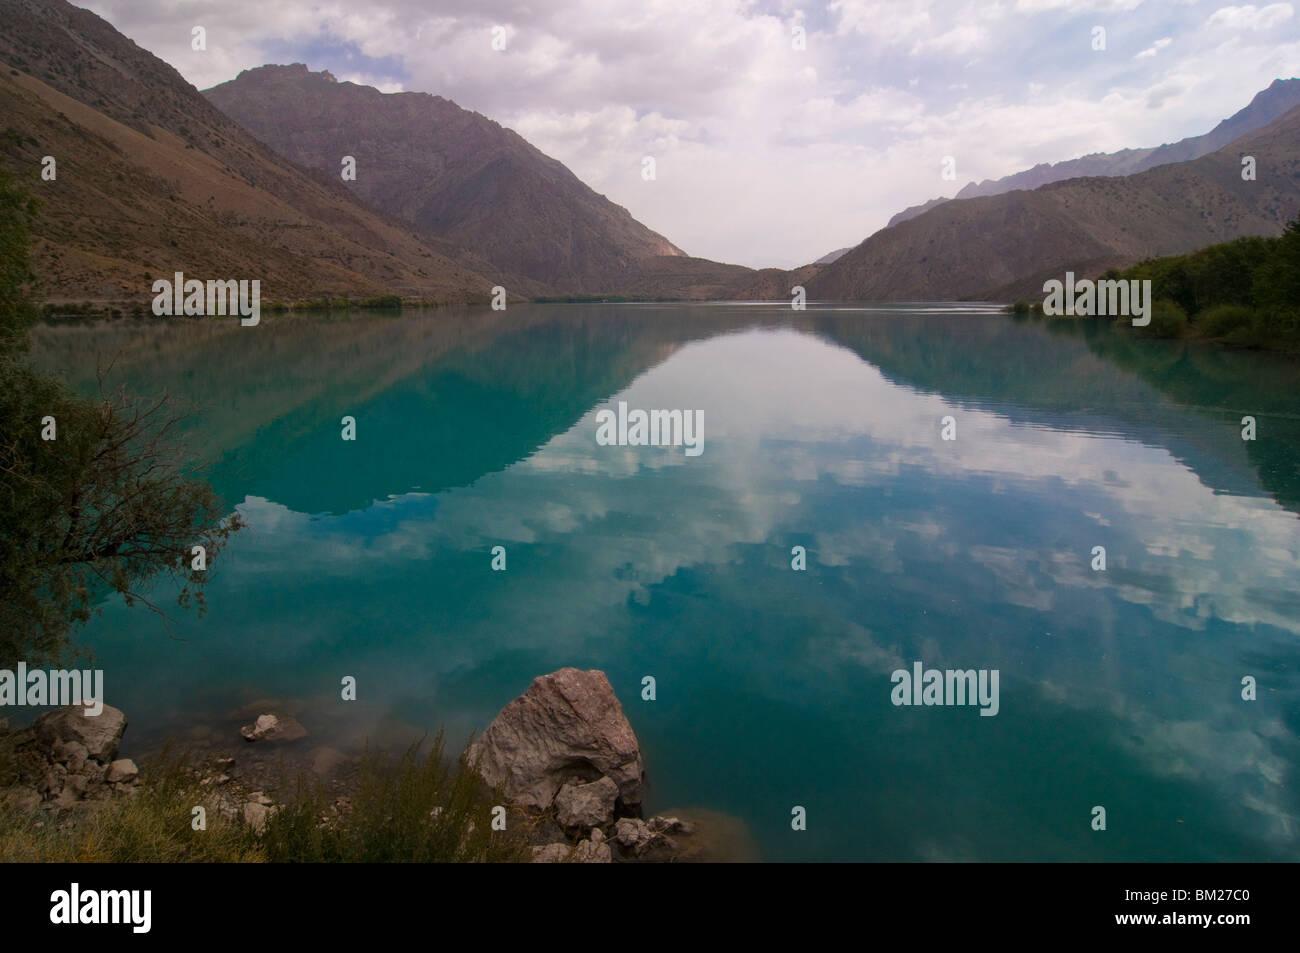 Türkis Iskanderkul See (Alexander) in Fann Gebirge, Tadschikistan, Zentralasien Stockbild